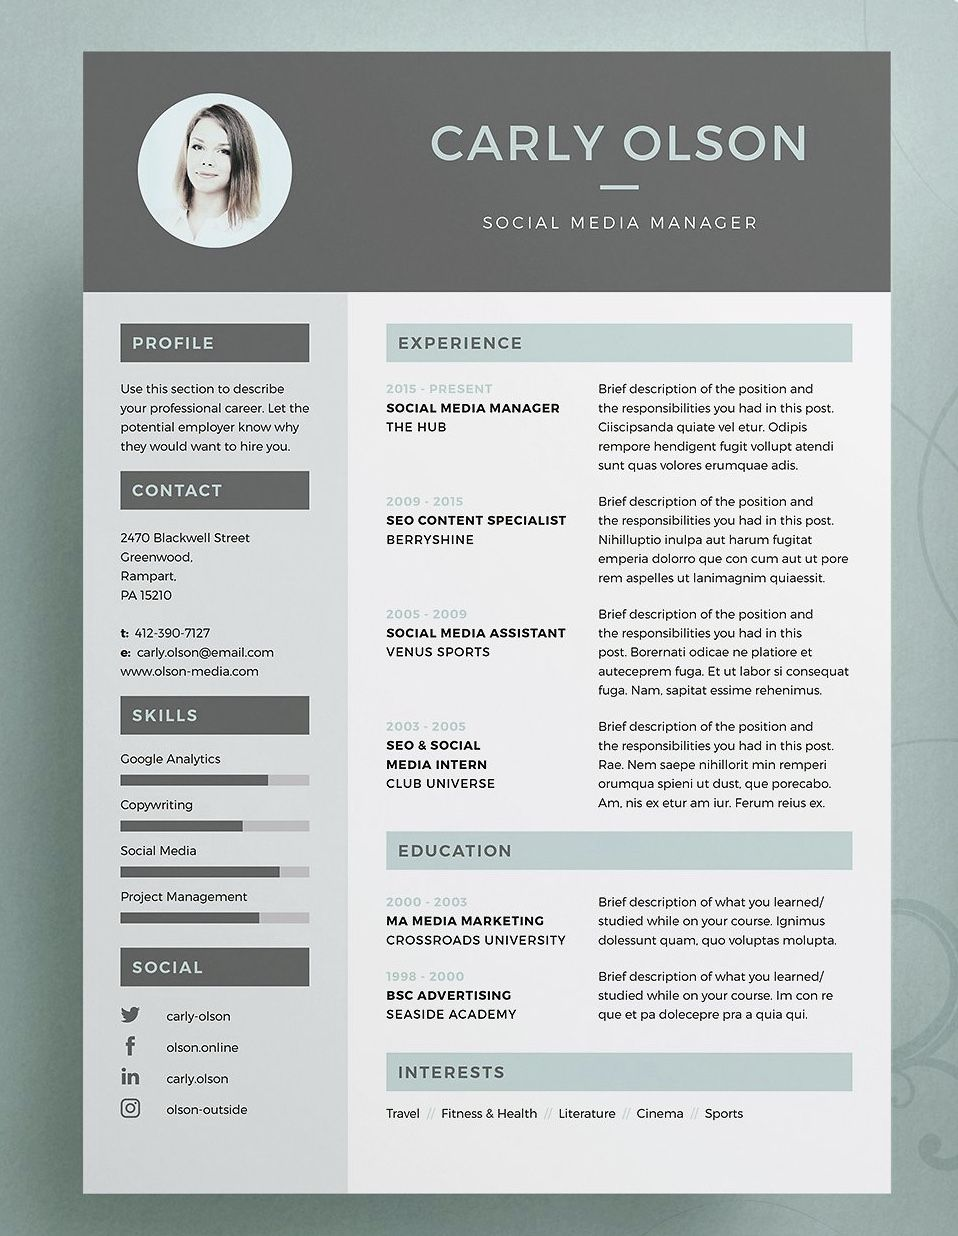 Resume Cv Carly Resume Design Free Resume Design Resume Design Creative